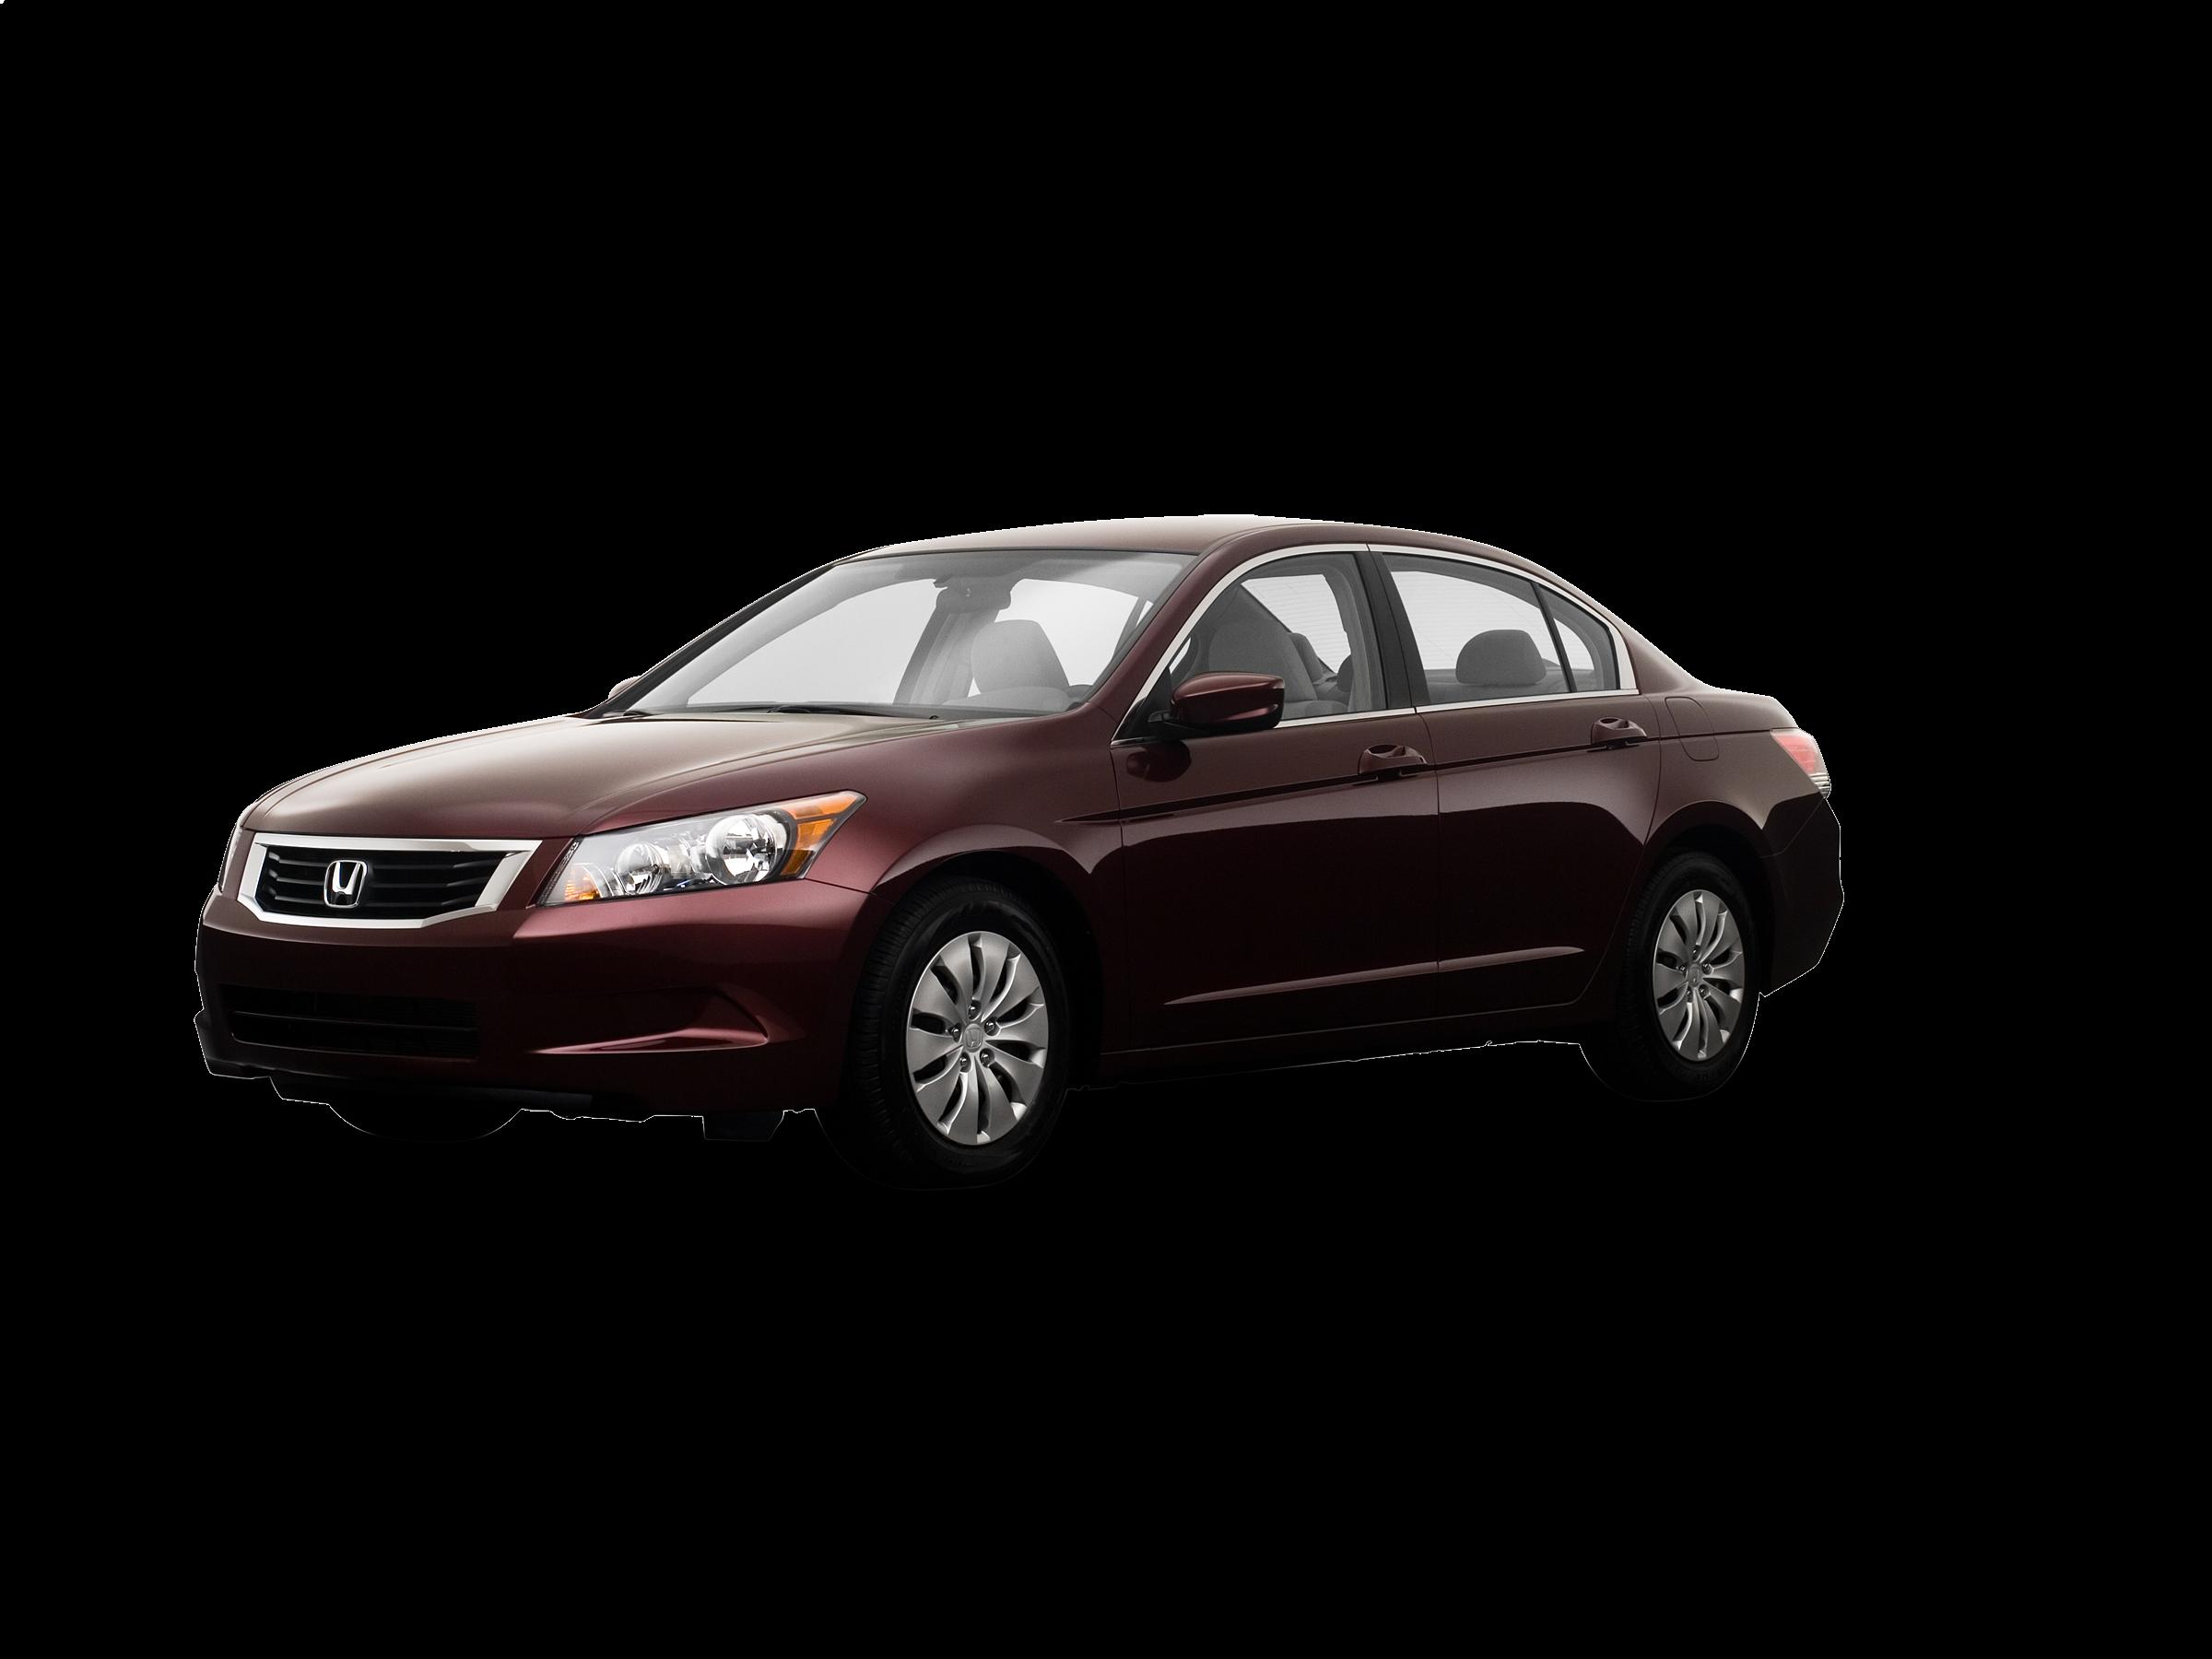 2009 Honda Accord Values Cars For Sale Kelley Blue Book